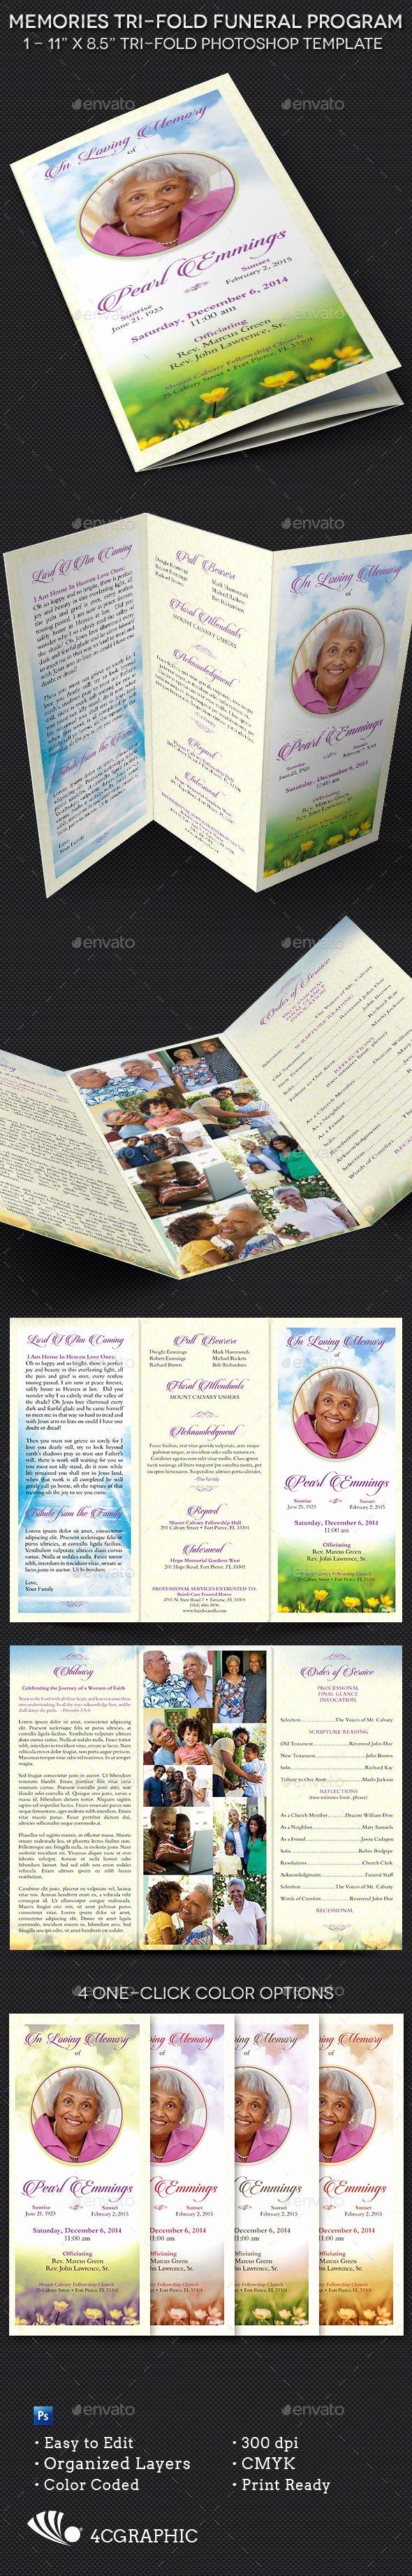 Tri Fold Funeral Program Template Fresh Memories Tri Fold Funeral Program Template